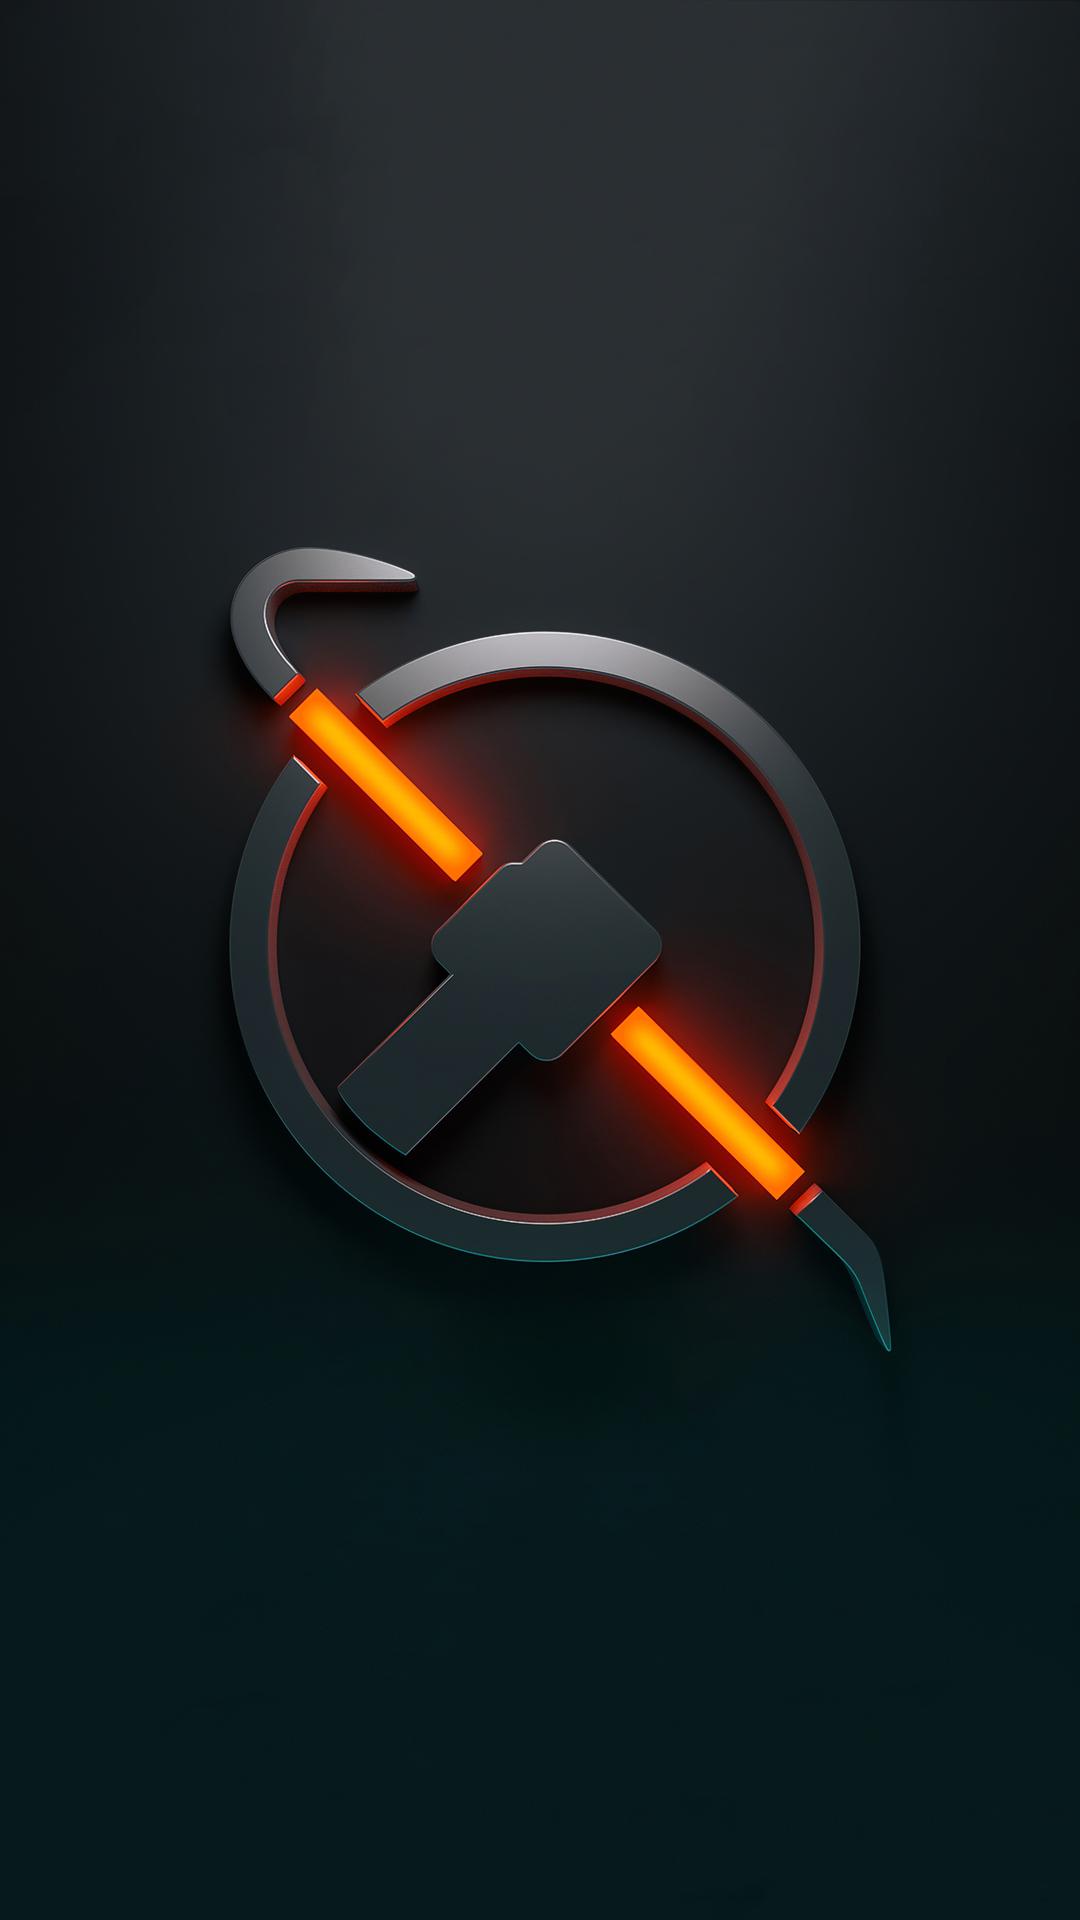 half-life-logo-4k-5v.jpg